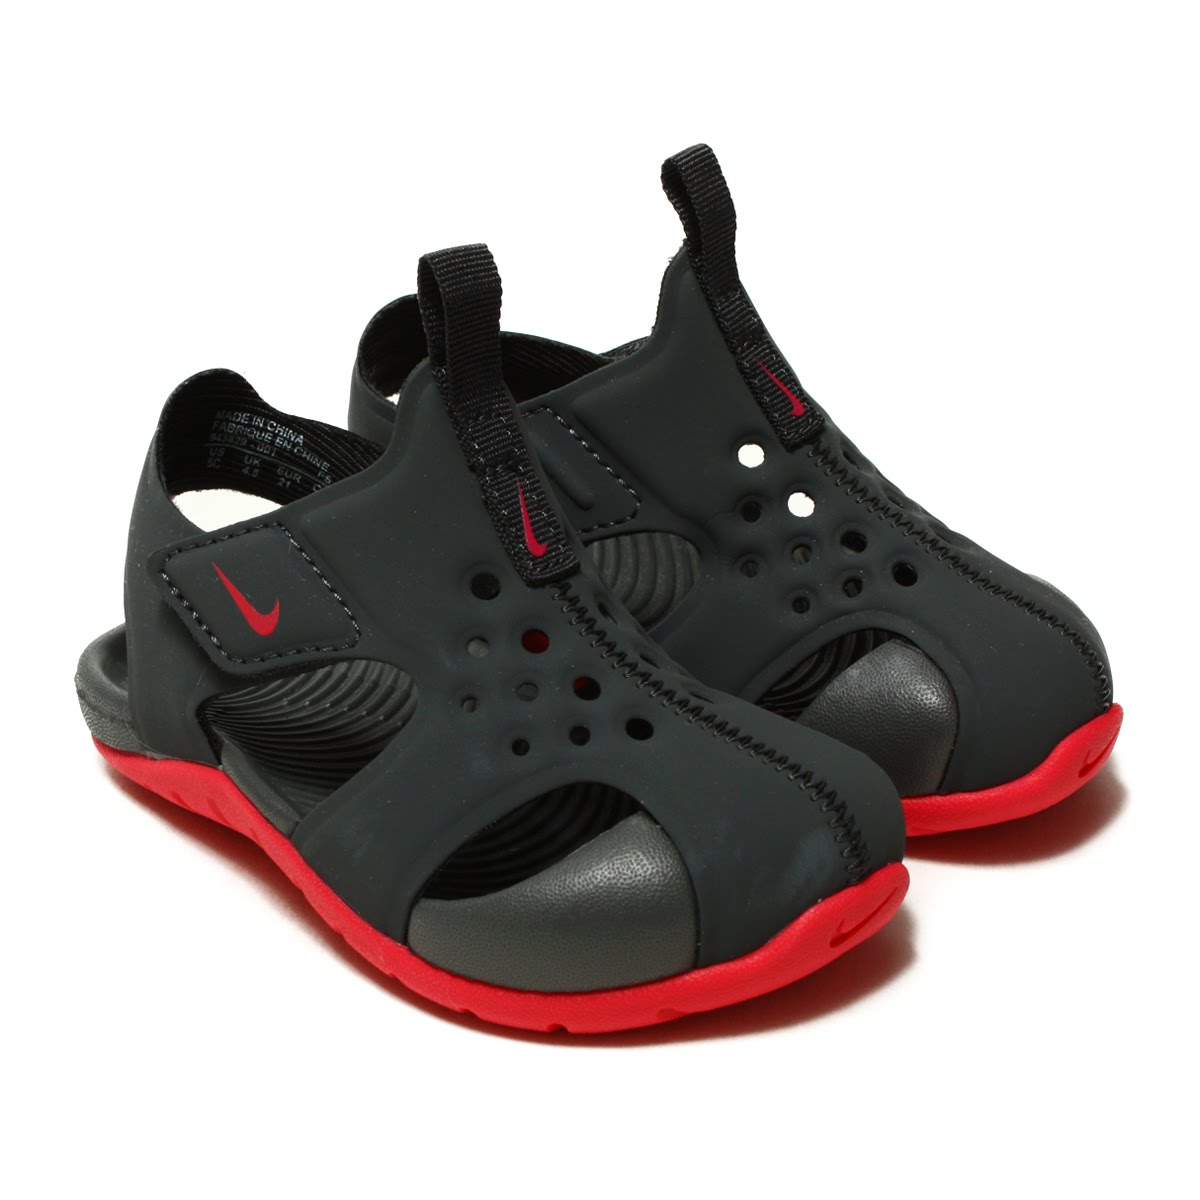 8b8eee2c11ec I update the sandals shoes